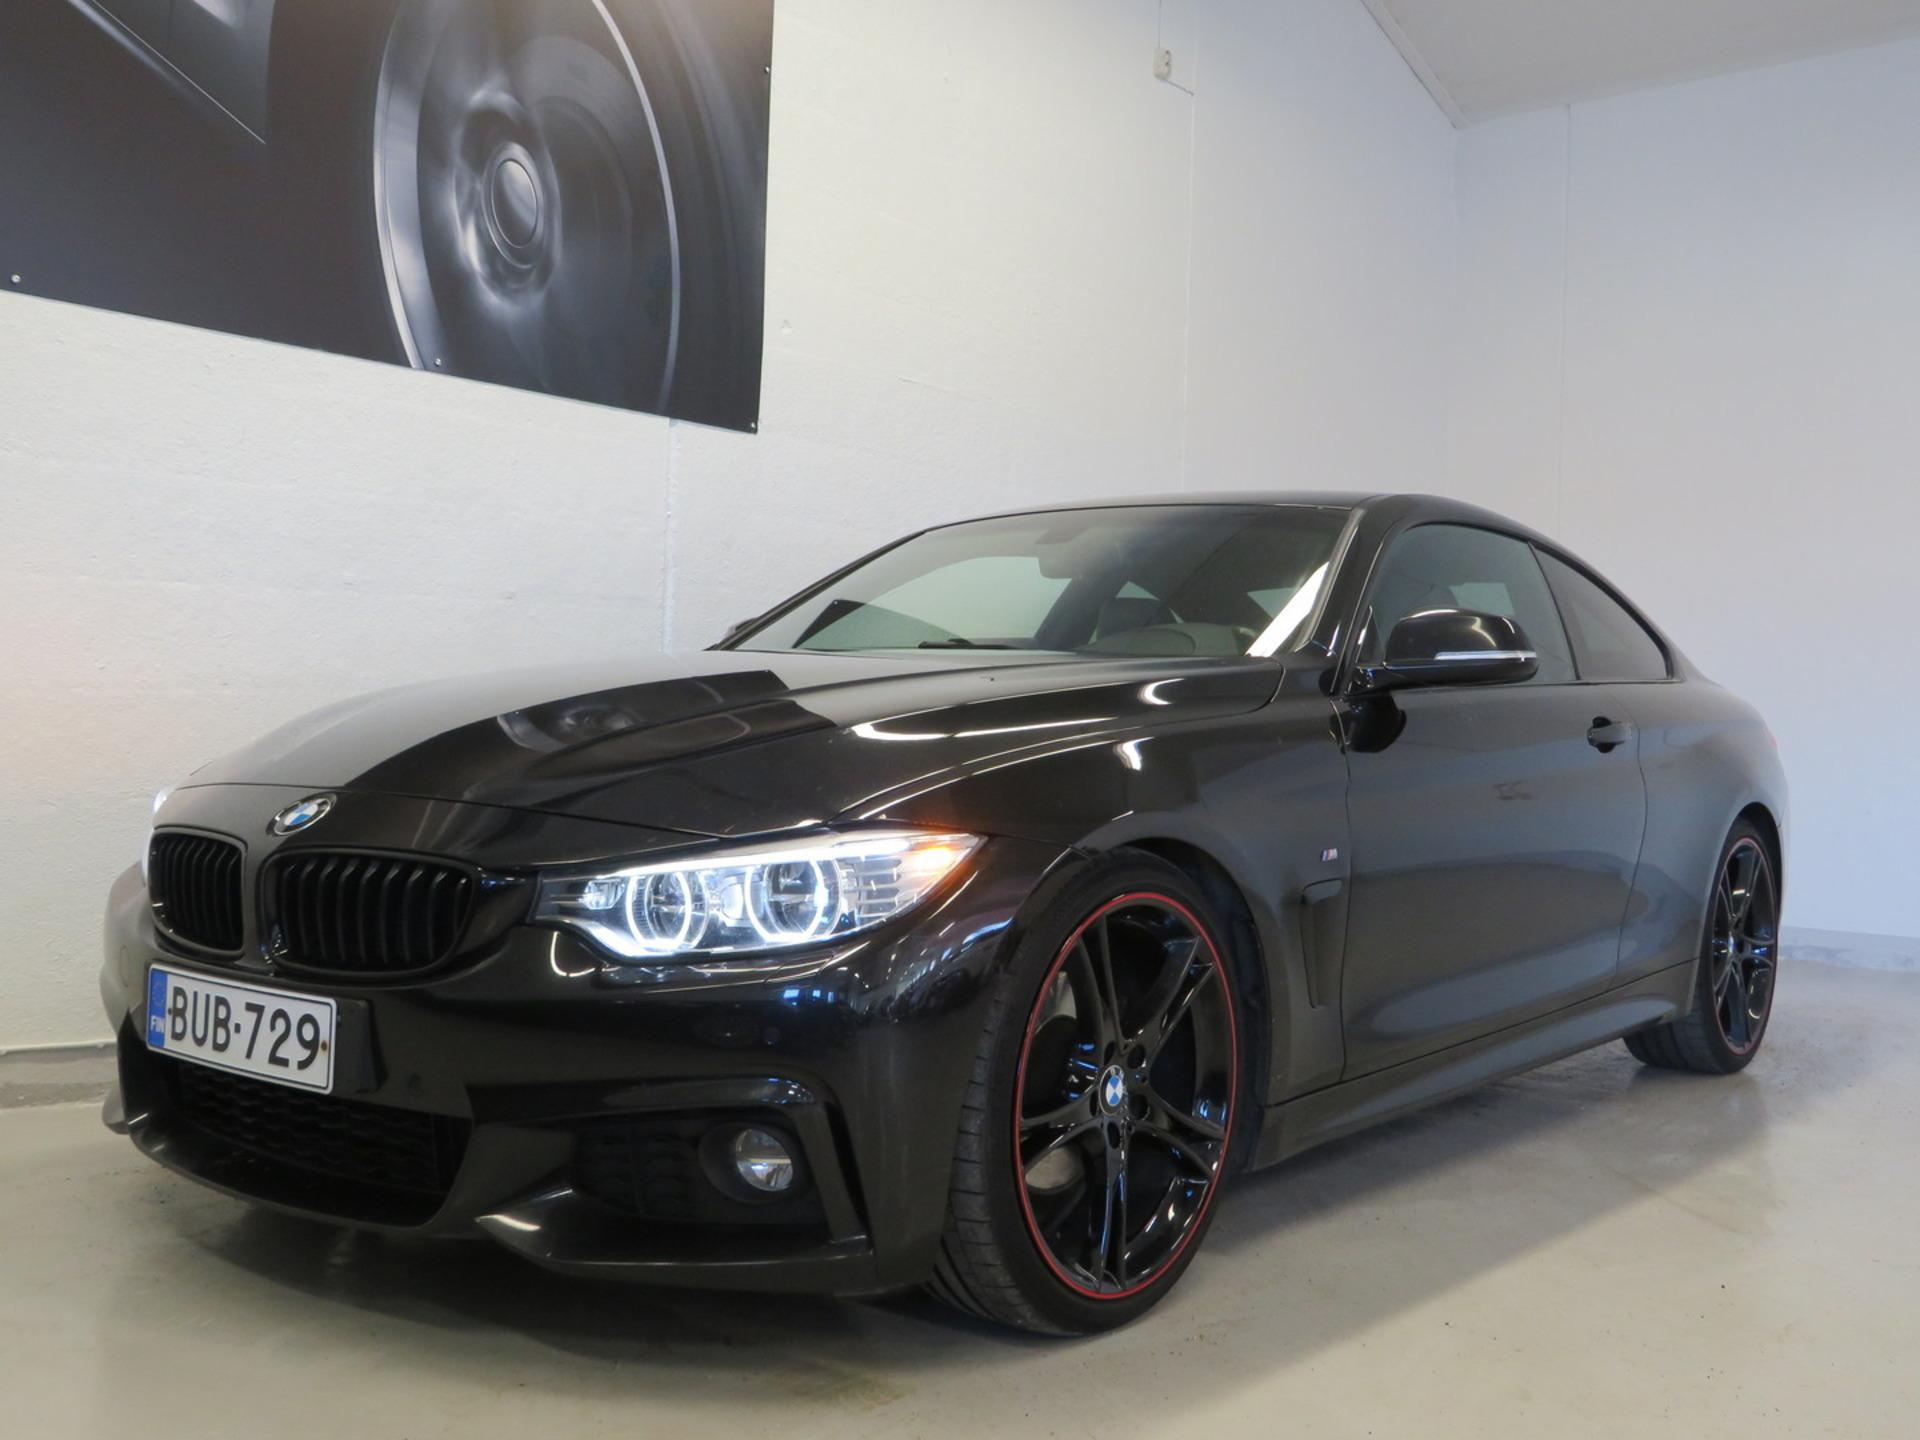 BMW 420 F32 Coupe 420d TwinPower Turbo Automatic M-Sport - ,  Korko 1, 99%! Sport-putkisto,  Prof.navi,  Nahkasisusta,  LED-ajovalot,  PDC,  20